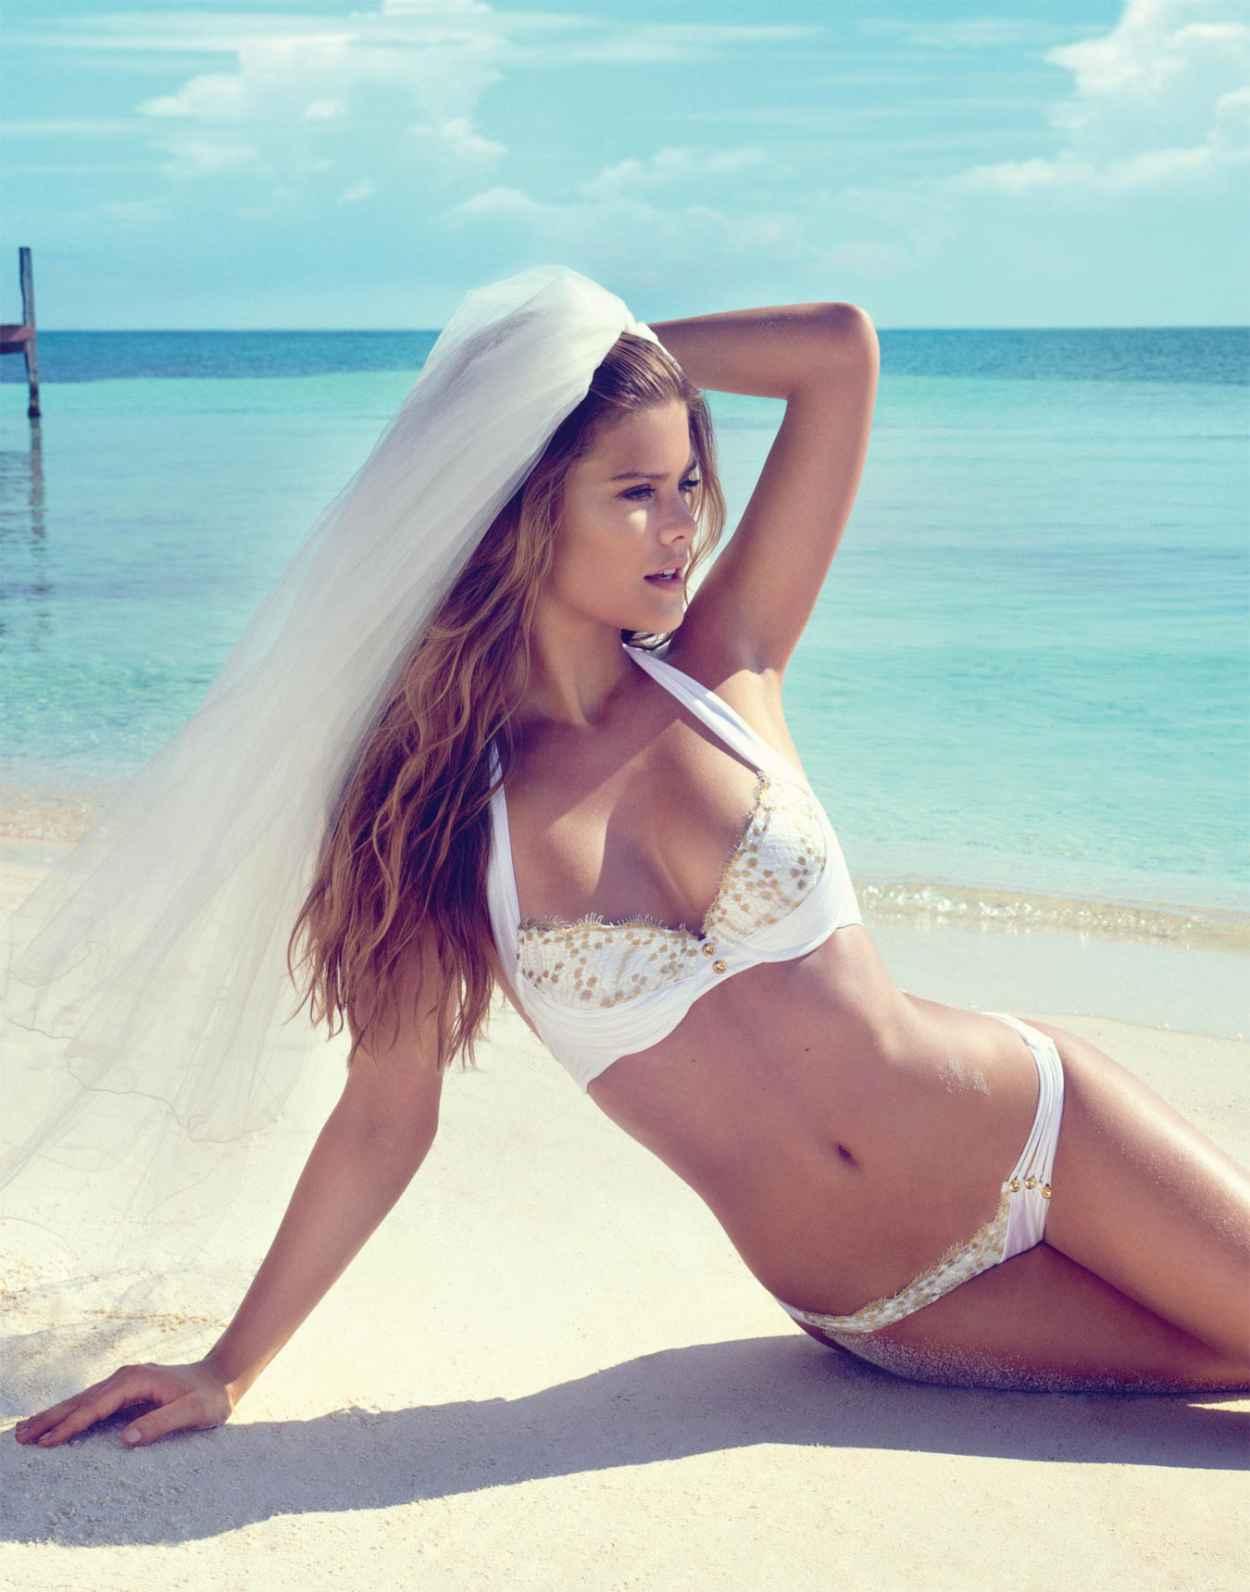 Nina Agdal Photoshoot - Beach Bunny Bride 2015-1